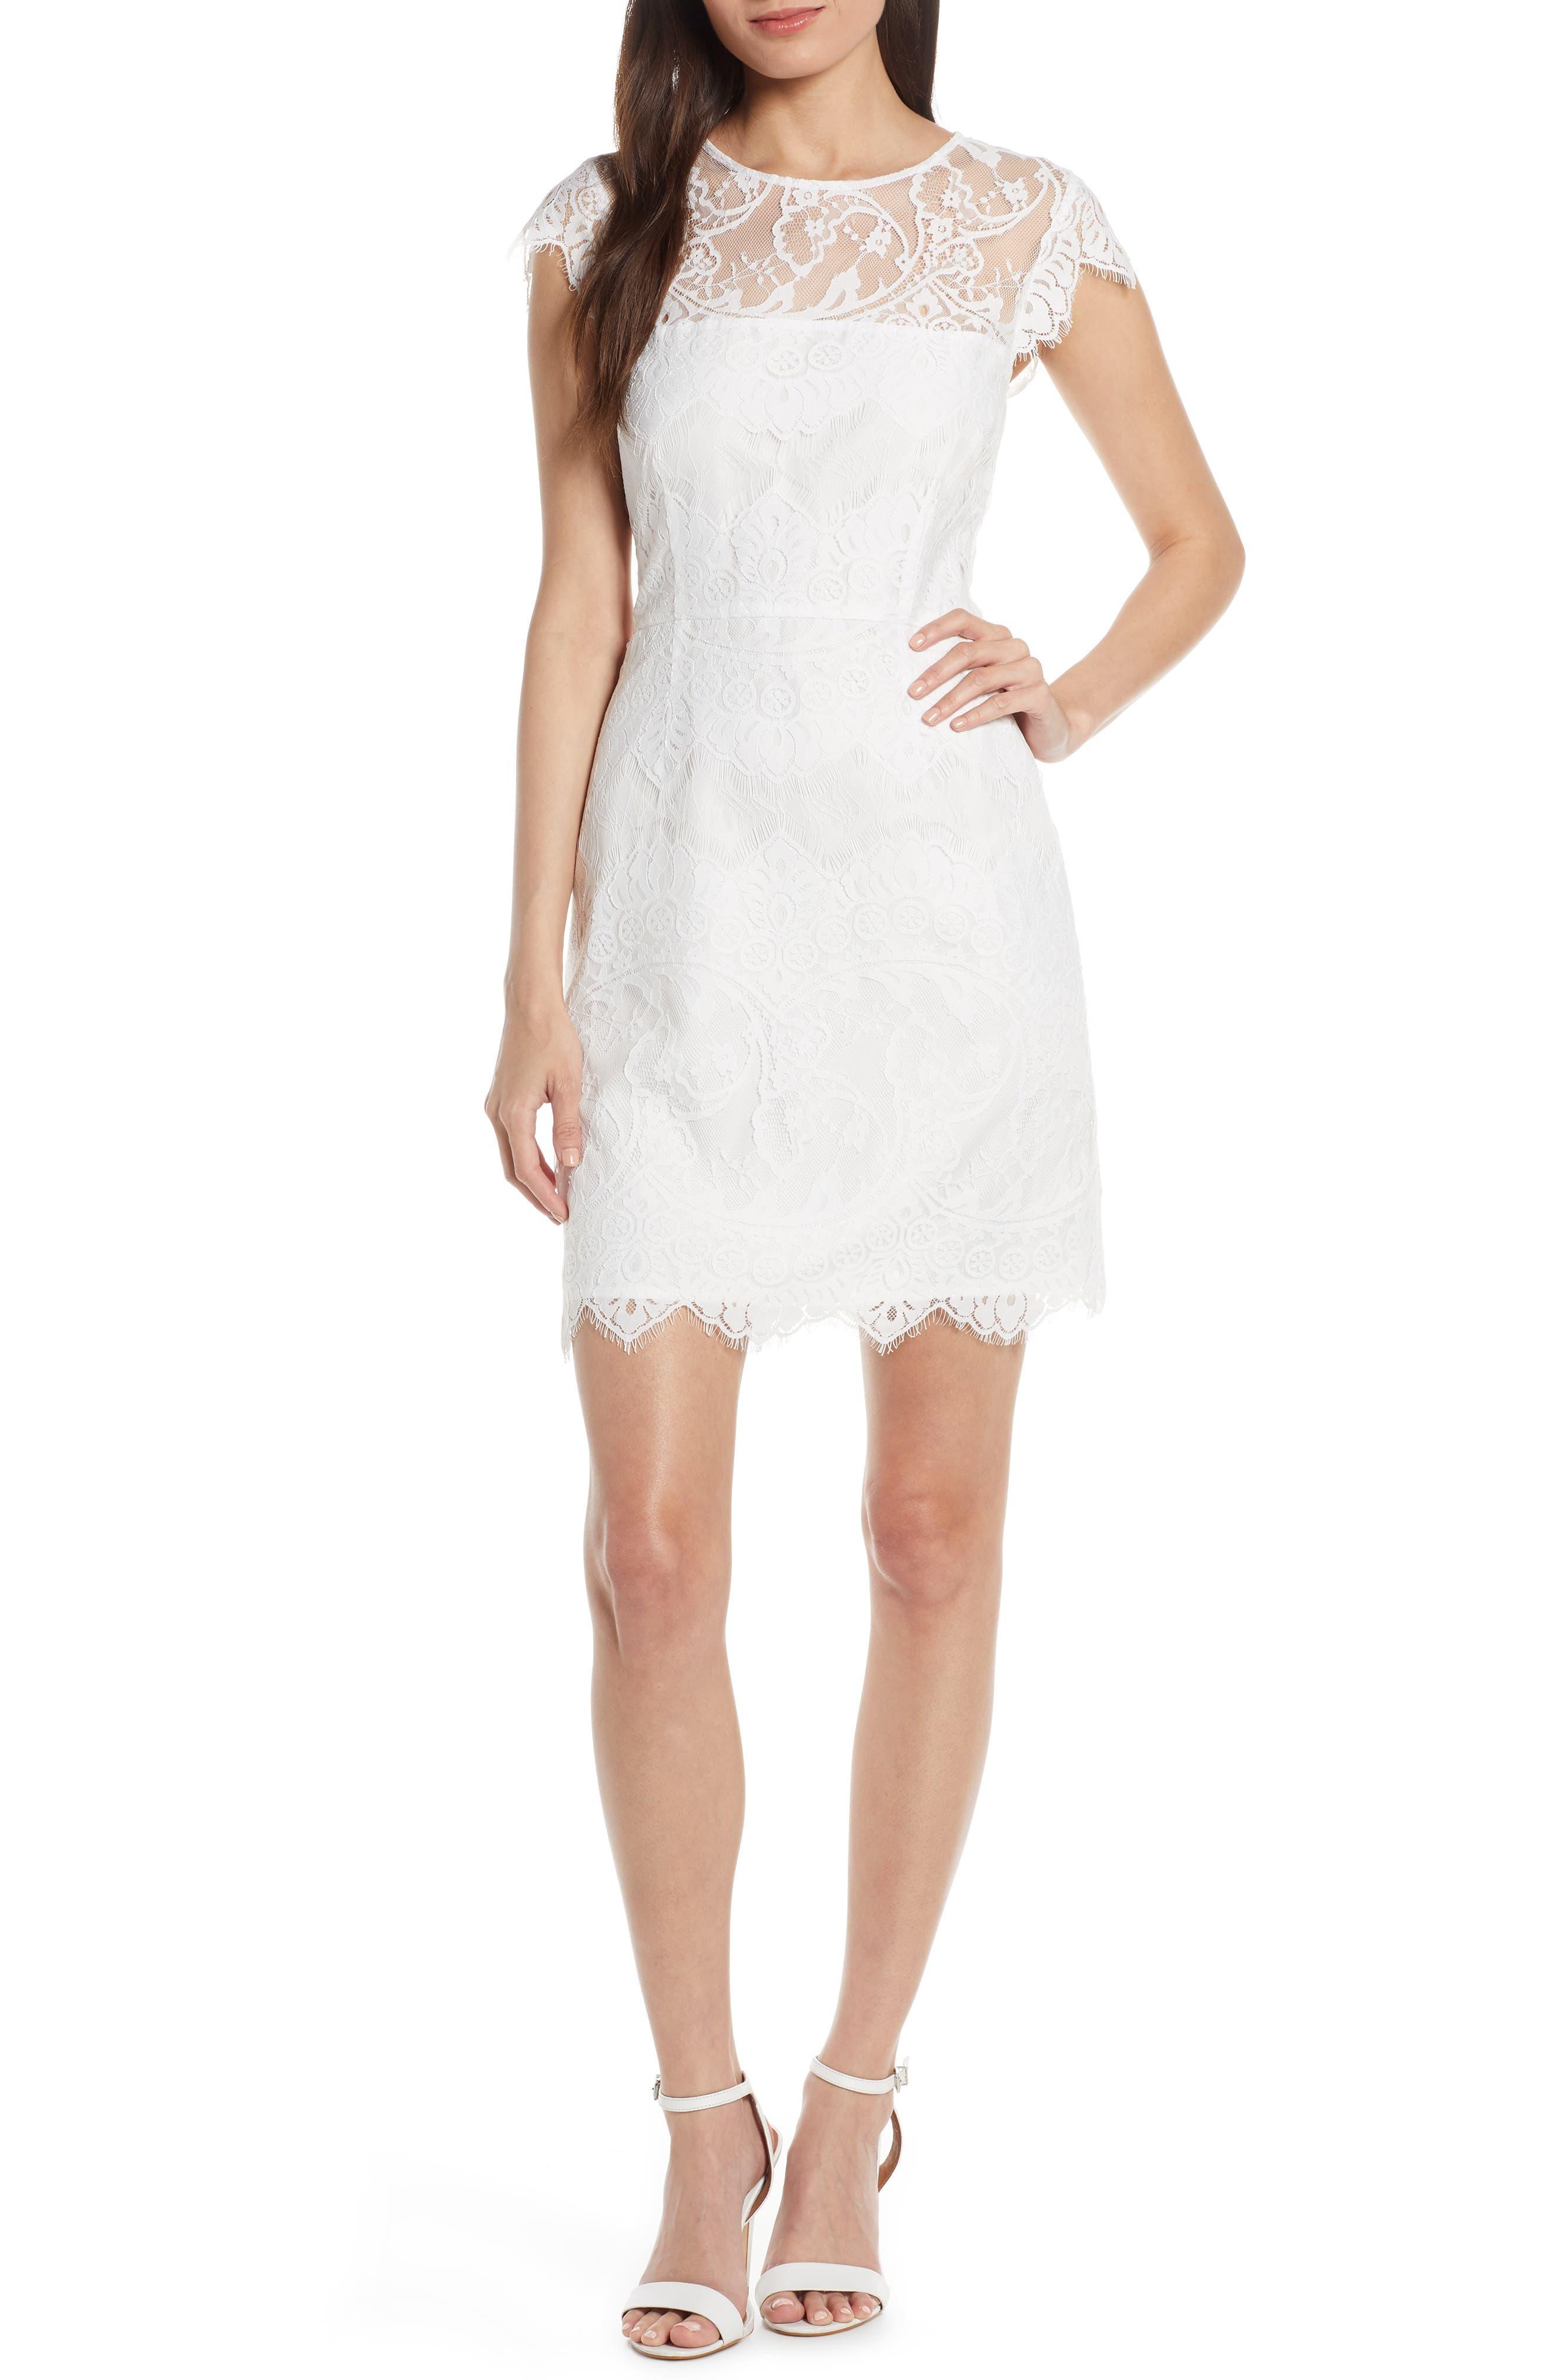 Bb Dakota Jayce Lace Sheath Cocktail Dress, White